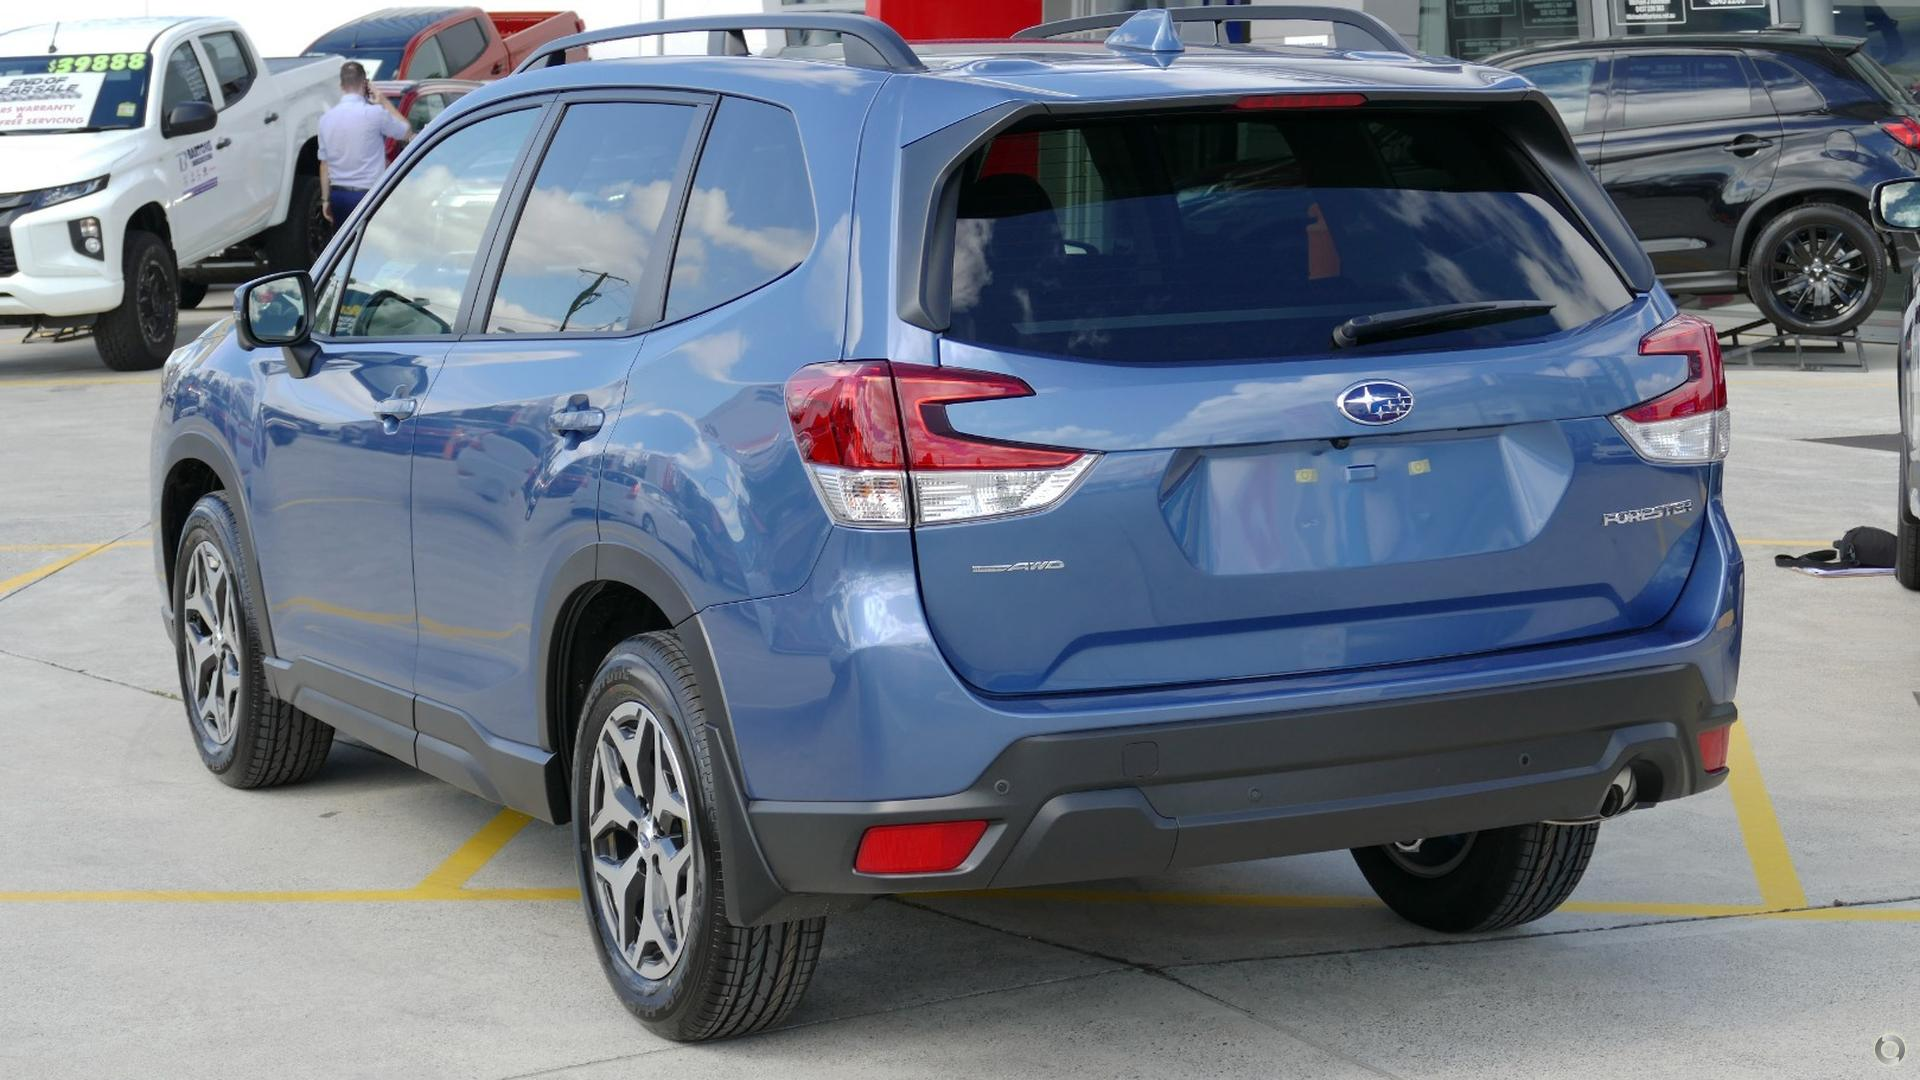 2020 Subaru Forester 2.5i-L S5